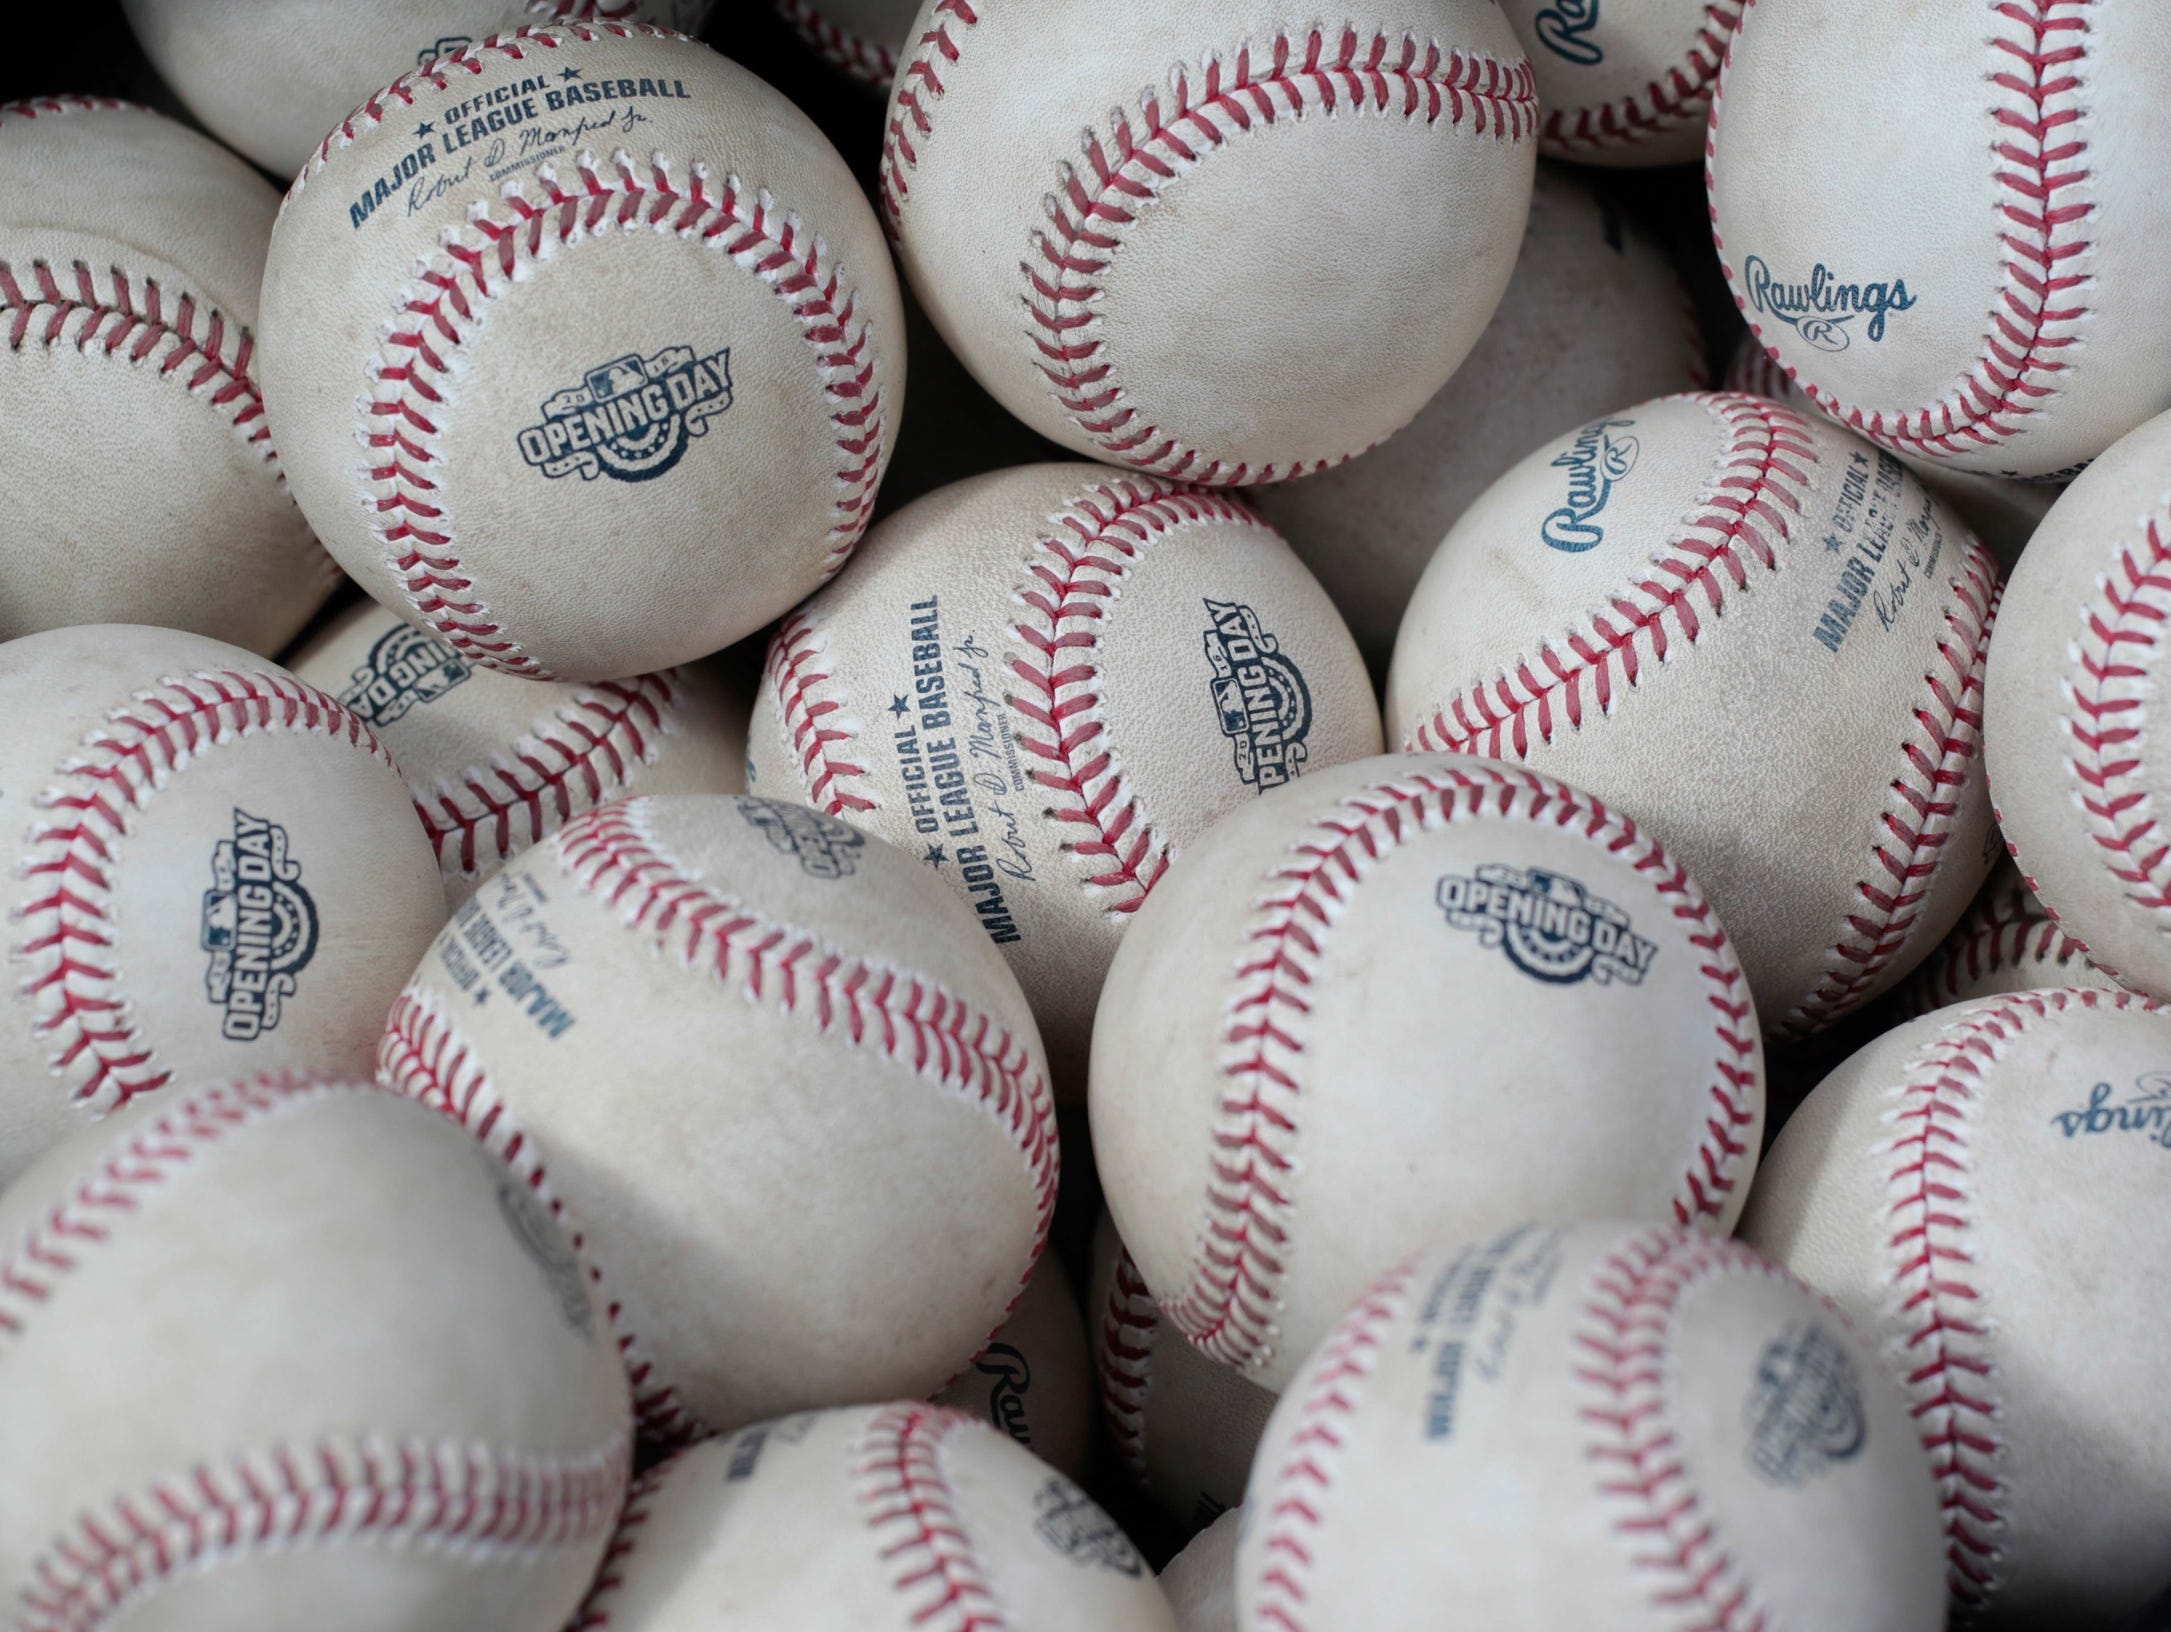 Baseballs.